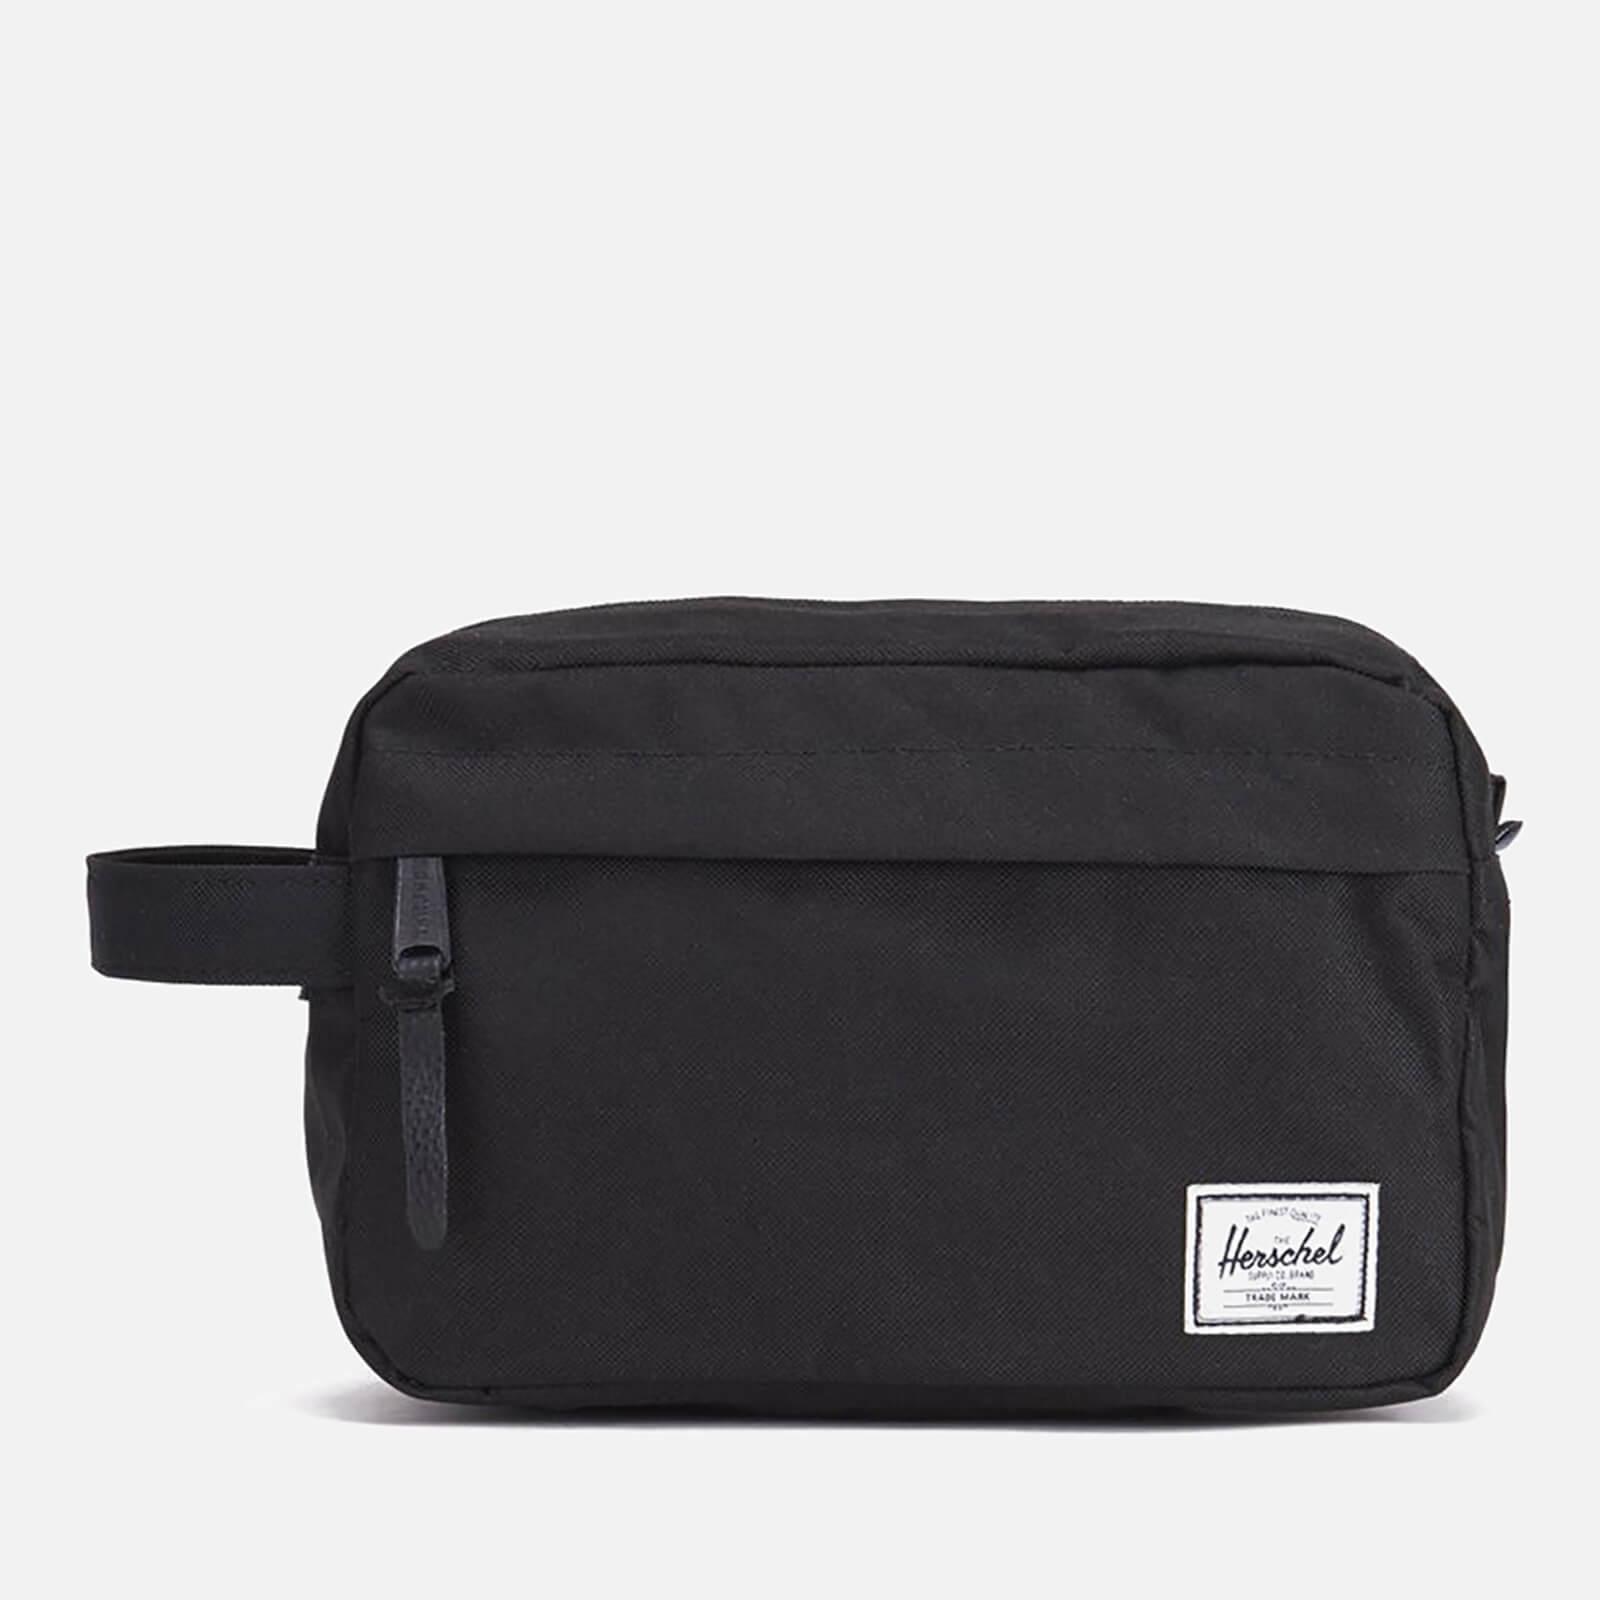 Herschel Supply Co. Select Series Chapter Wash Bag - Black